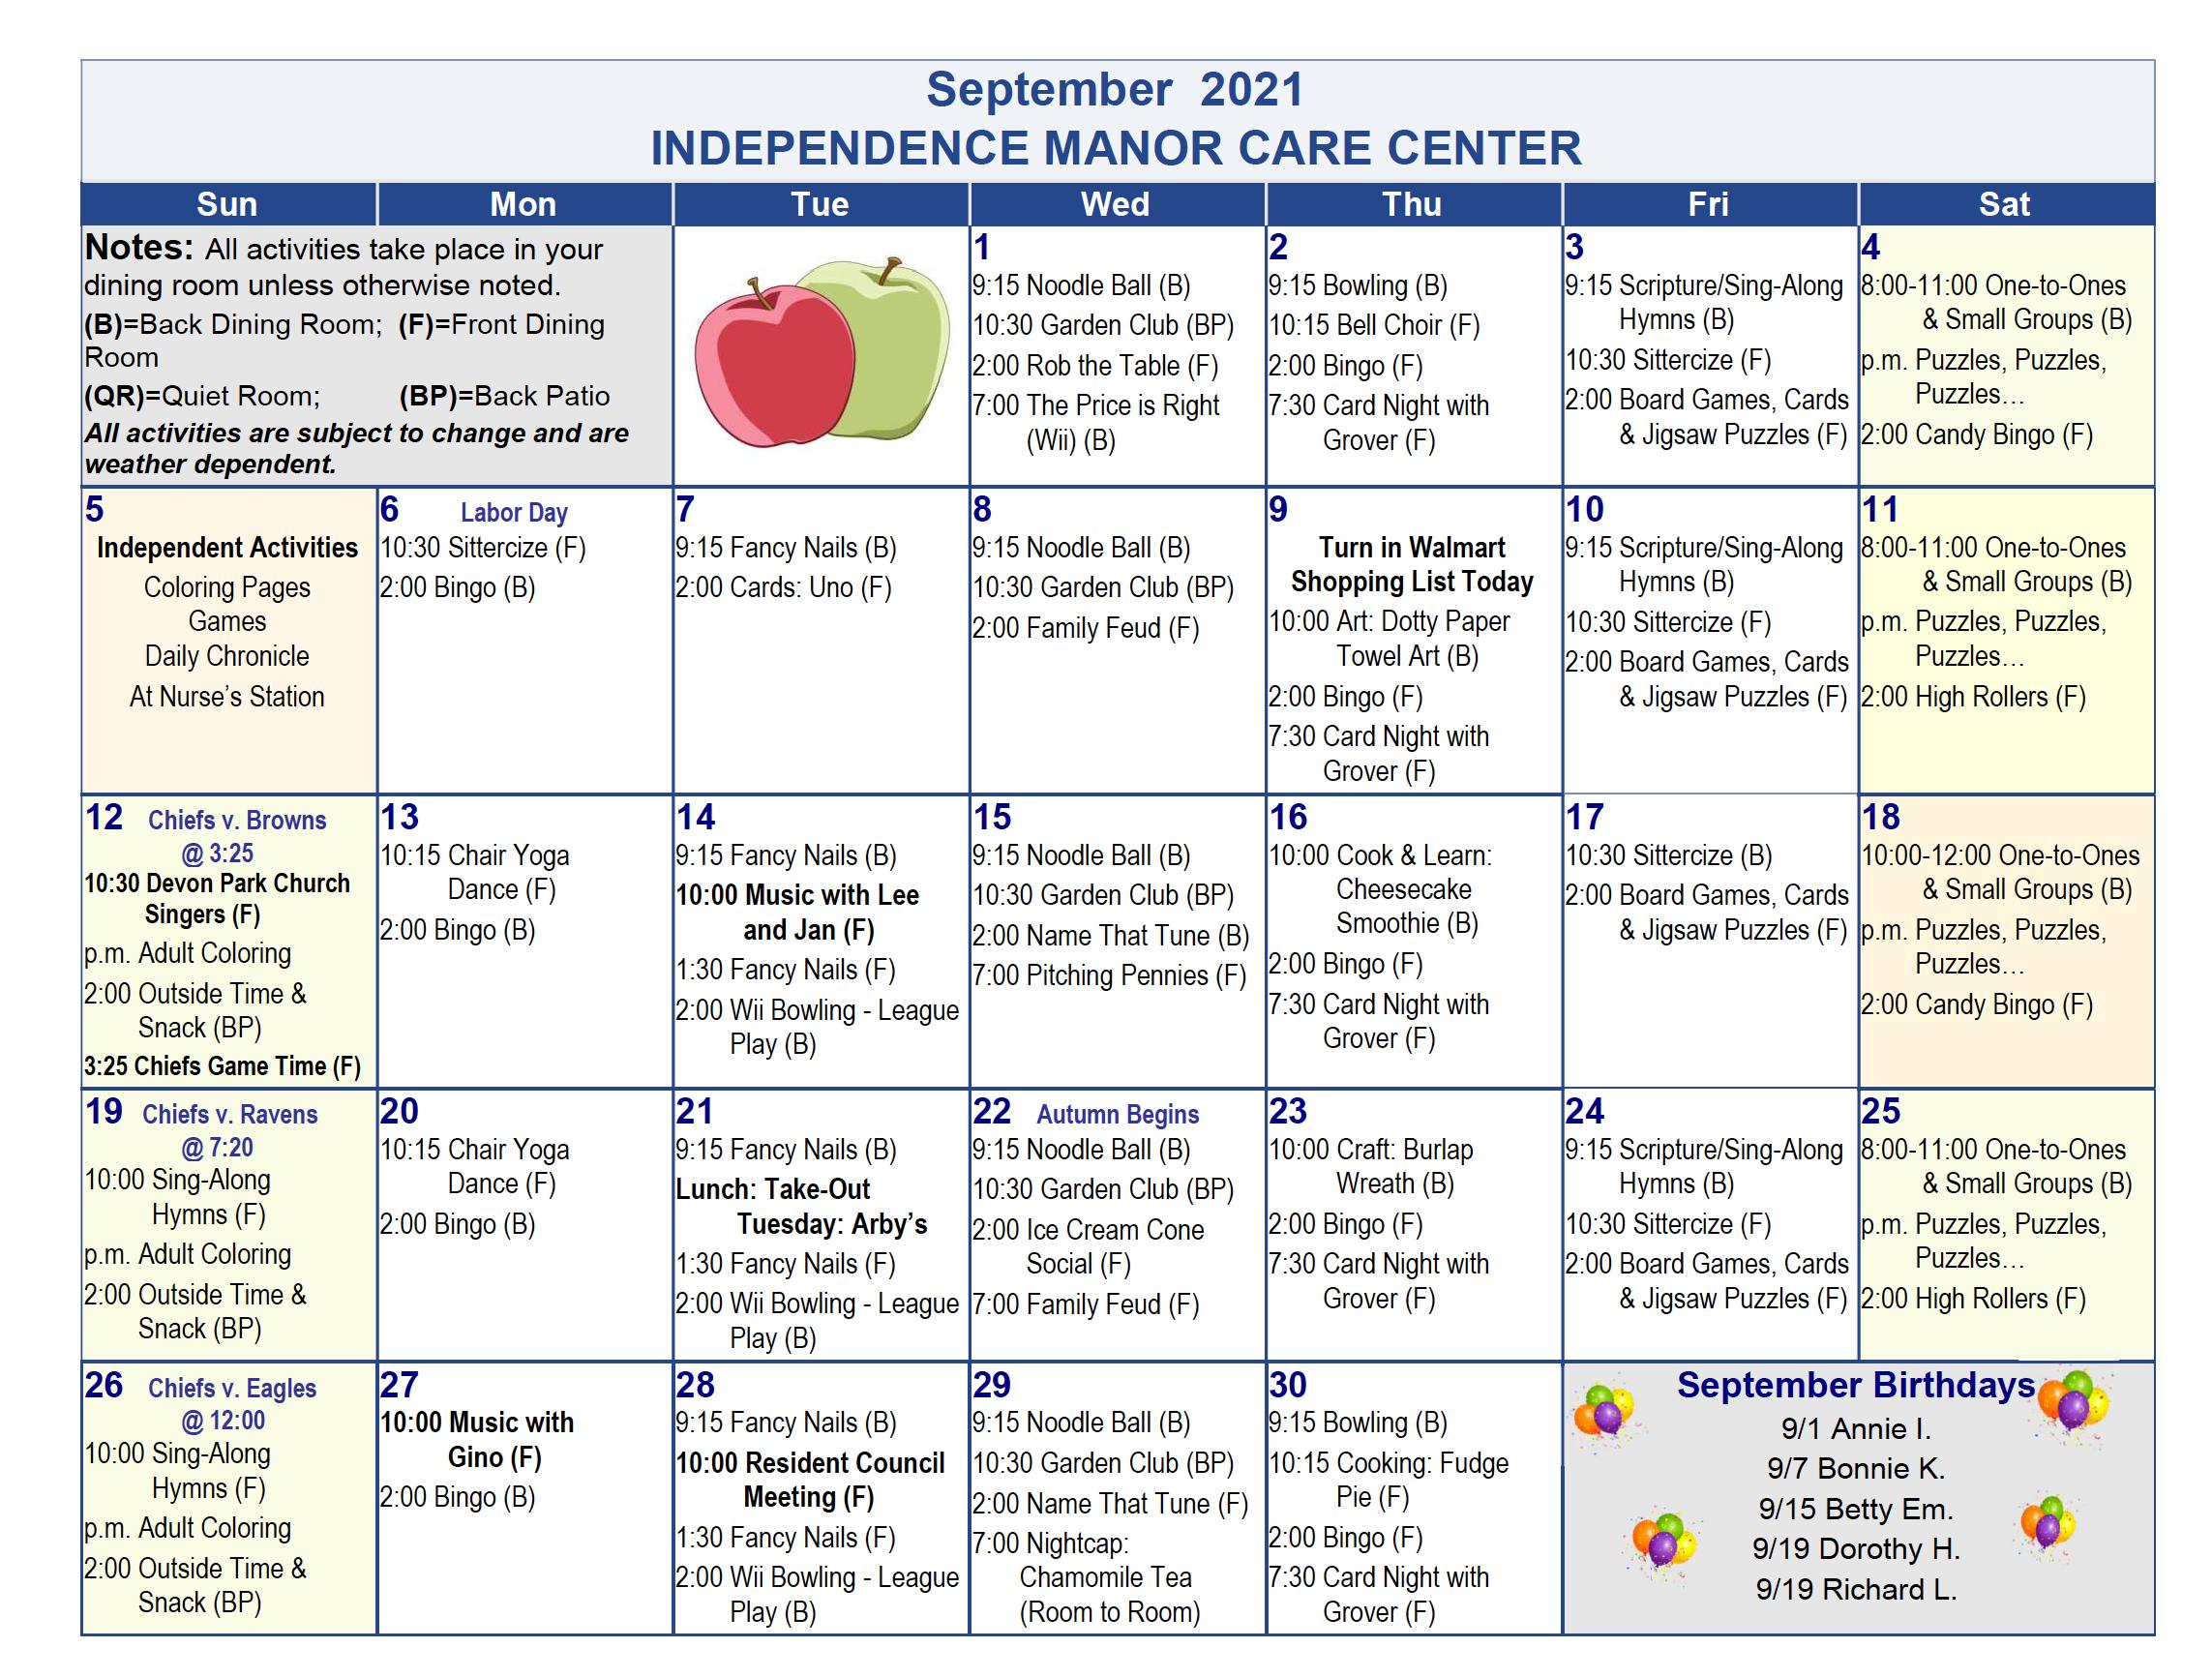 September Independence Manor Calendar